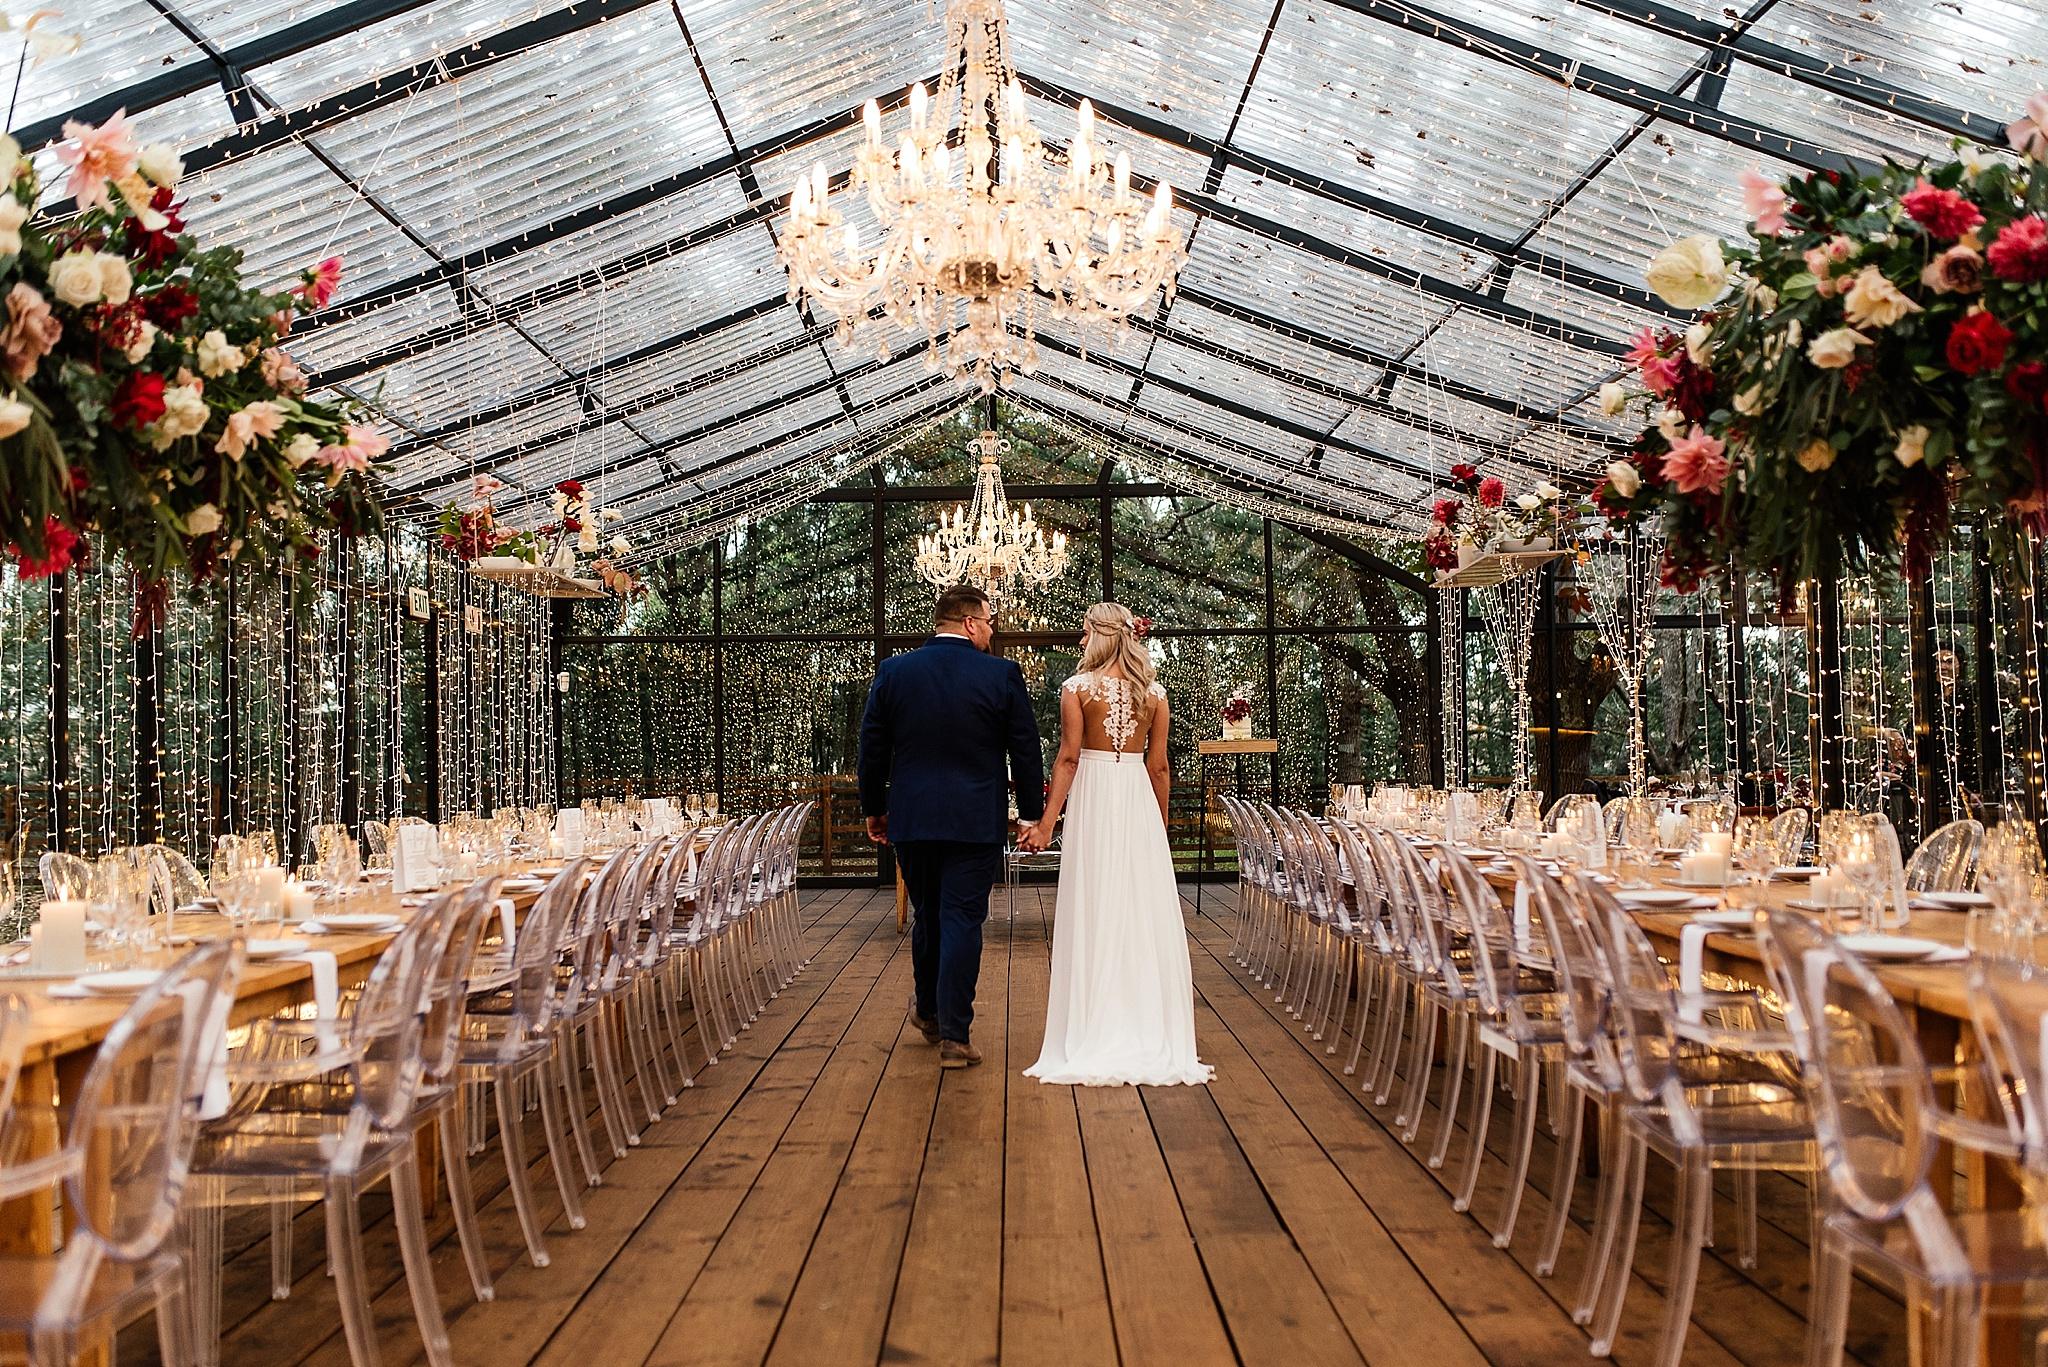 Cape Town Photographer Darren Bester - Die Woud Wedding - Gareth & Roxanne_0046.jpg